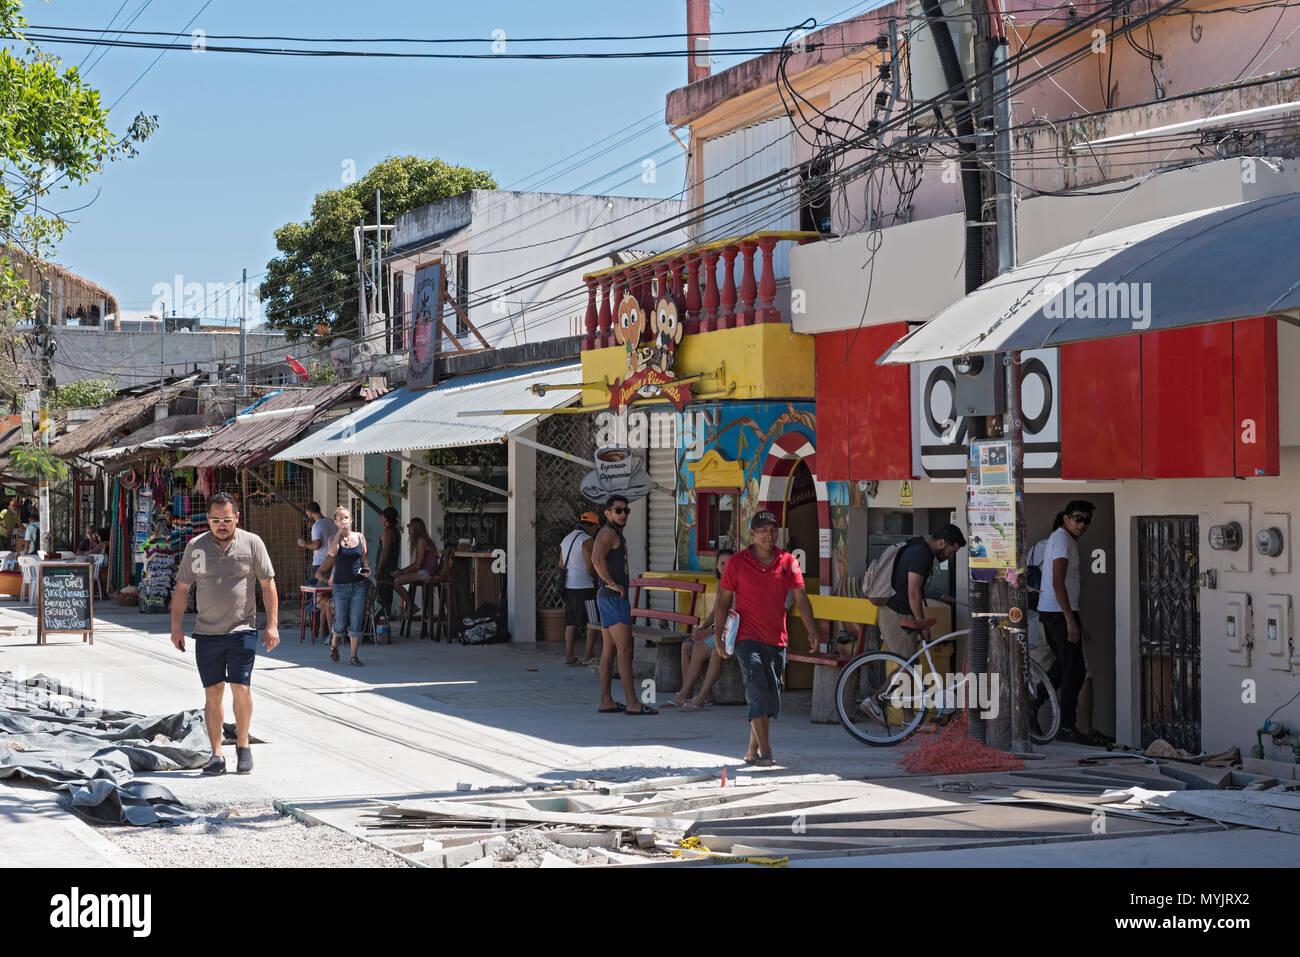 restaurants and tourists on avenida tulum, tulum, quintana roo, mexico - Stock Image